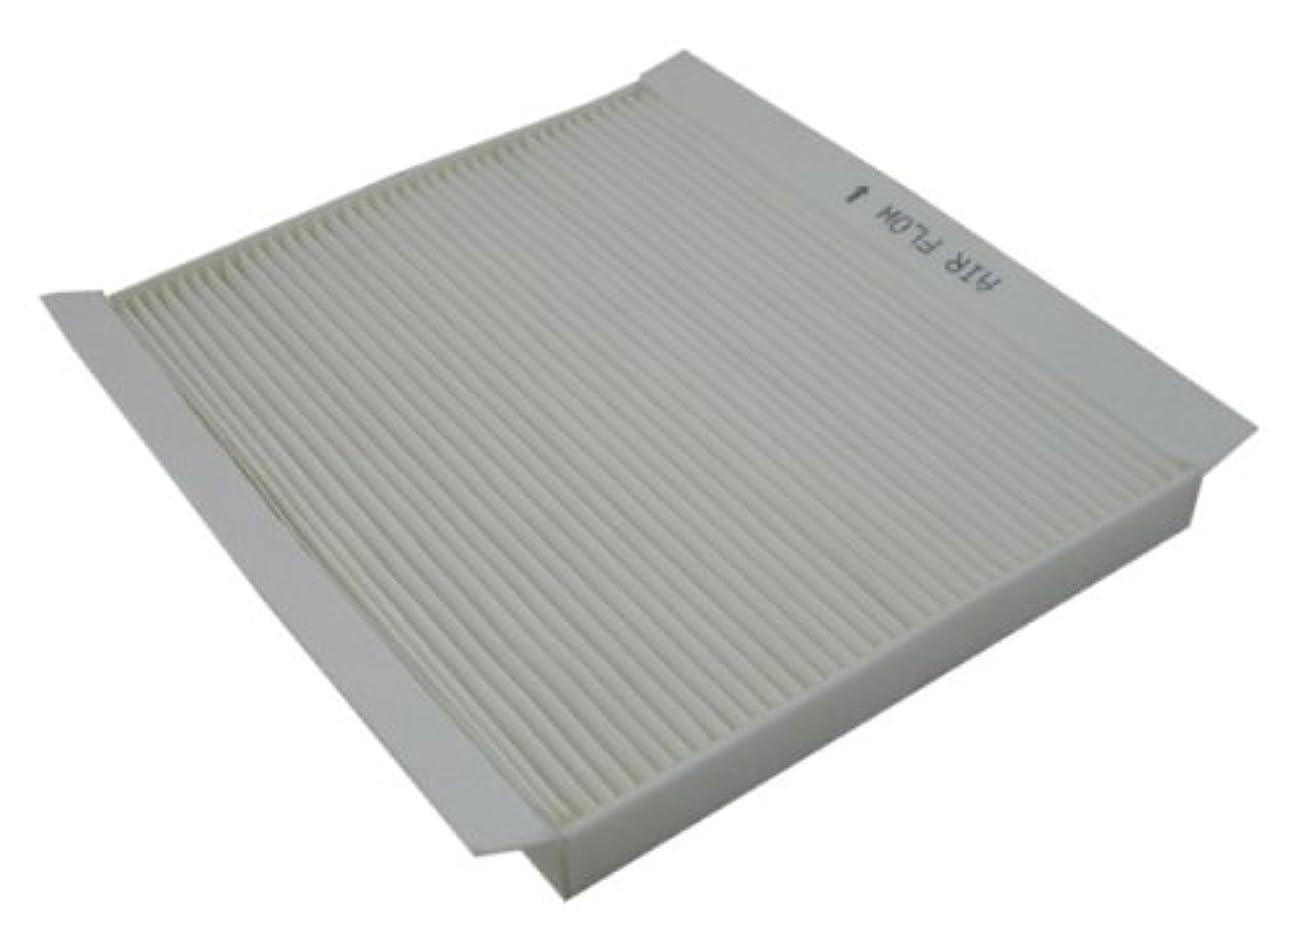 Pentius PHB5660 UltraFLOW Cabin Air Filter for Hyundai Elantra 2.0L(07-08, from 07/01/06), Accent (08-09)